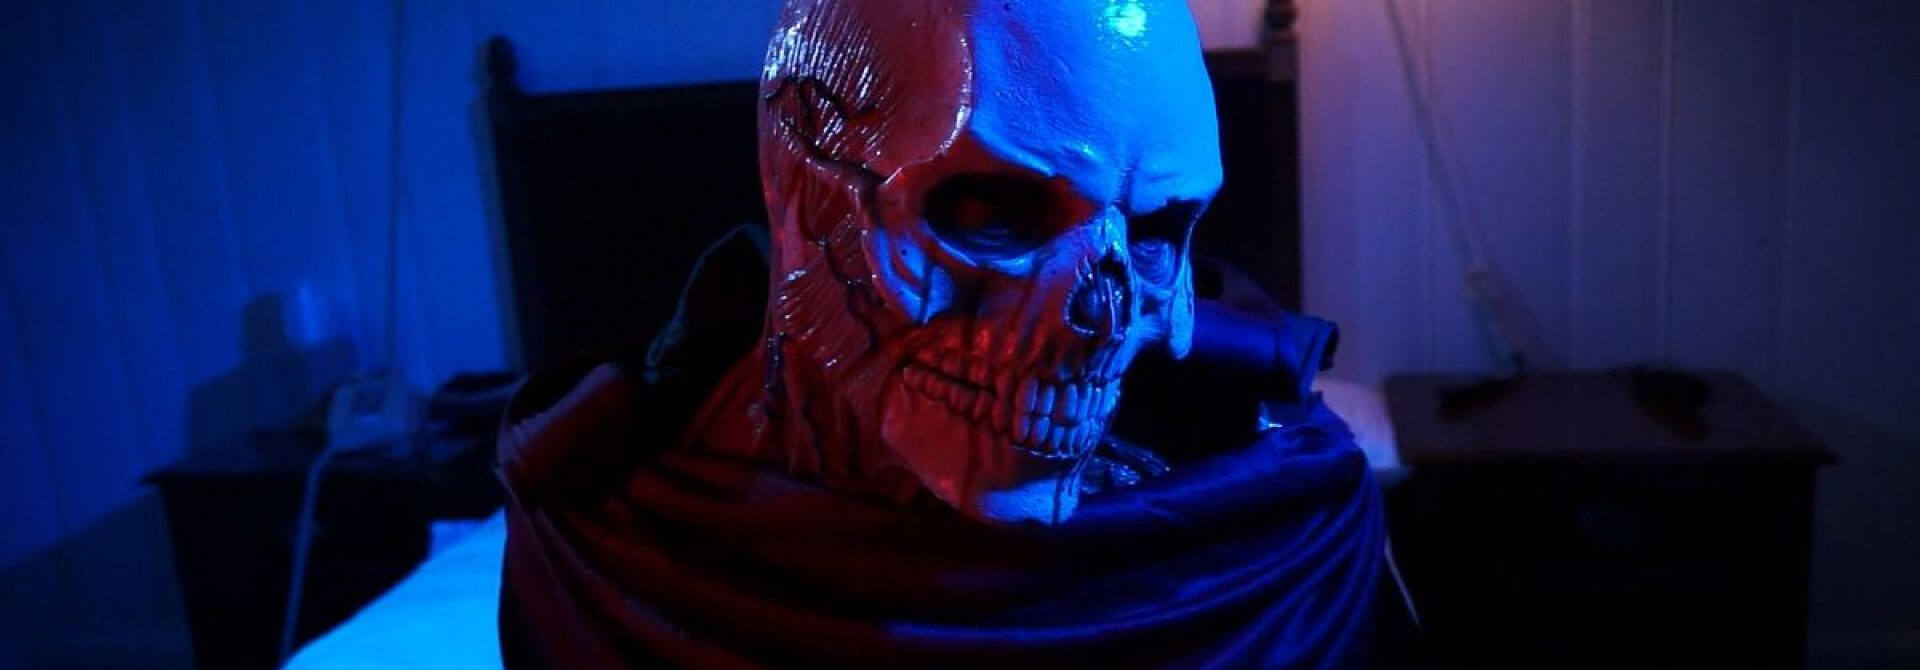 Hi-Death Comes Into Focus This June